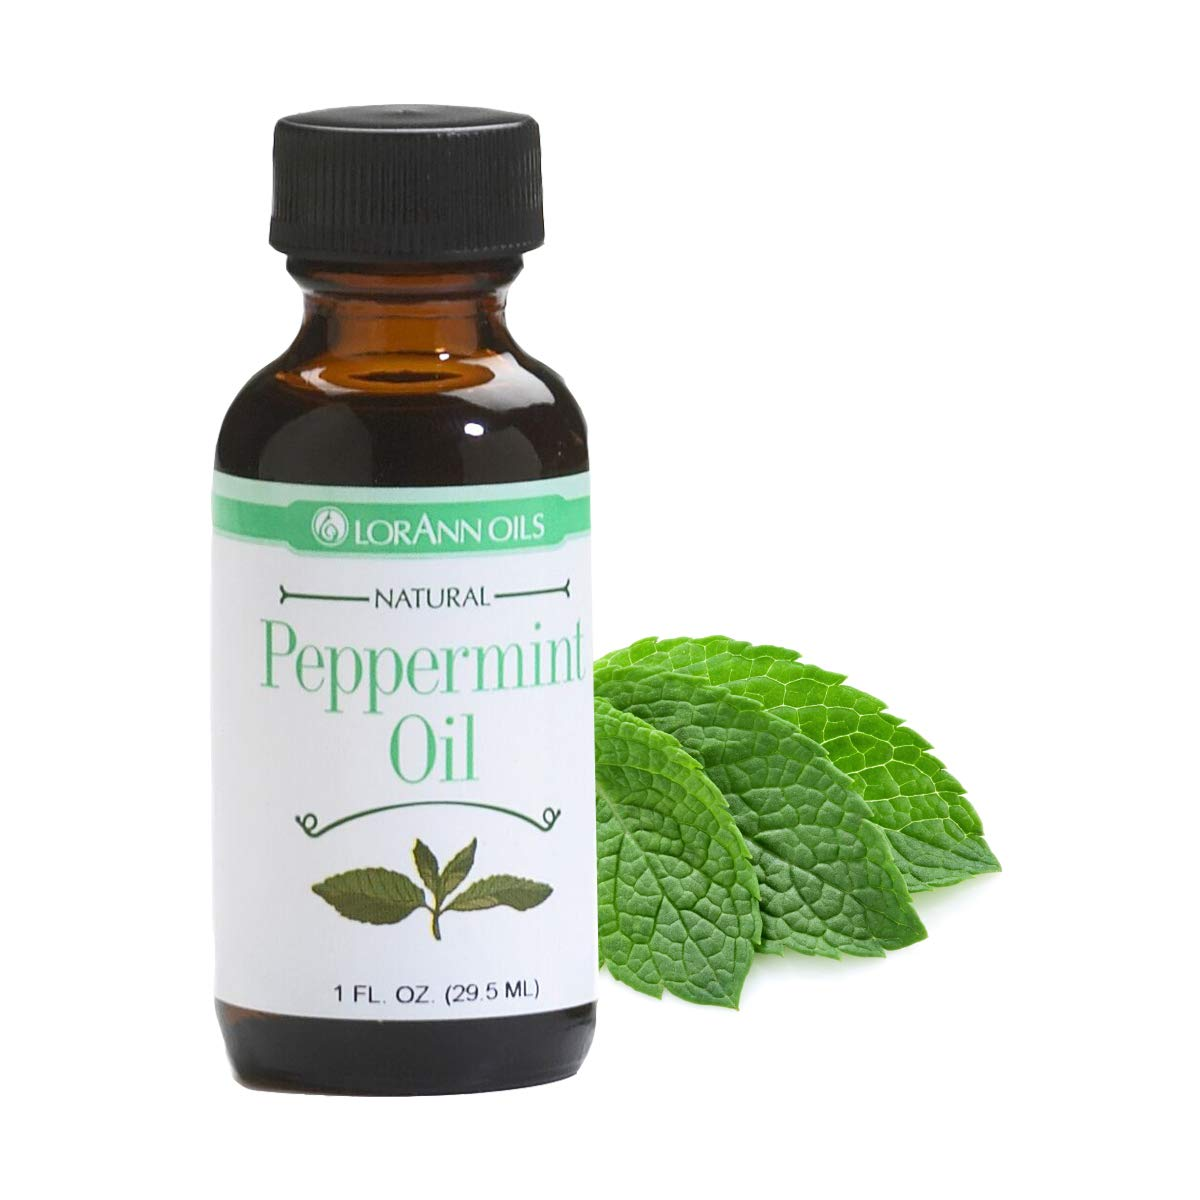 LorAnn Peppermint Oil Super Strength Natural Flavor, 1 ounce bottle